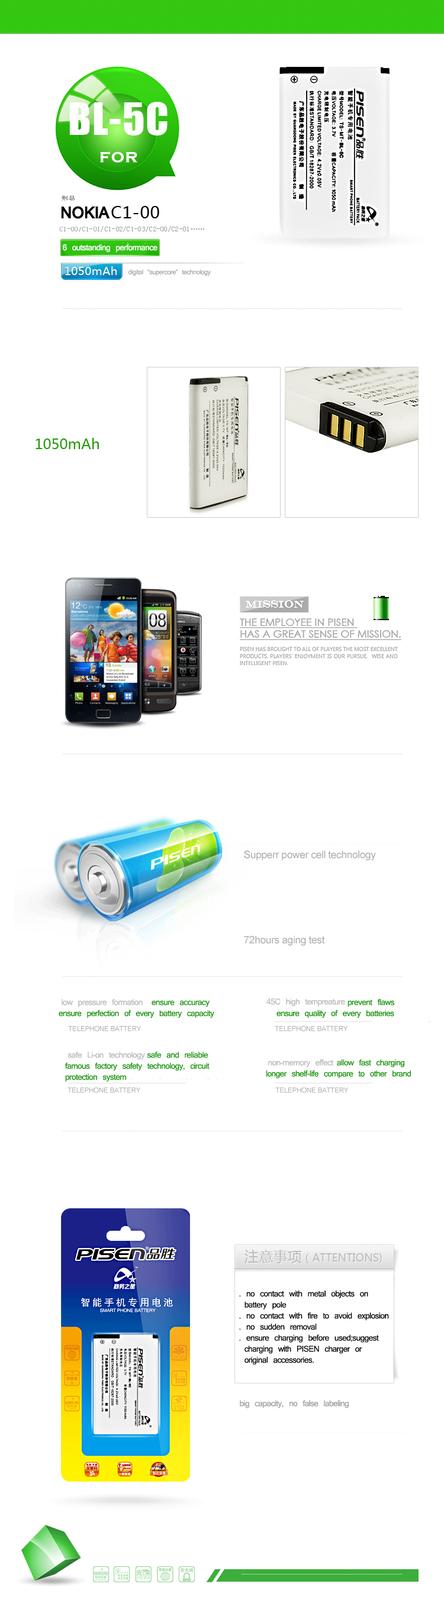 Pisen Phone Battery BL-5C Nokia E50 Nokia and 50 similar items